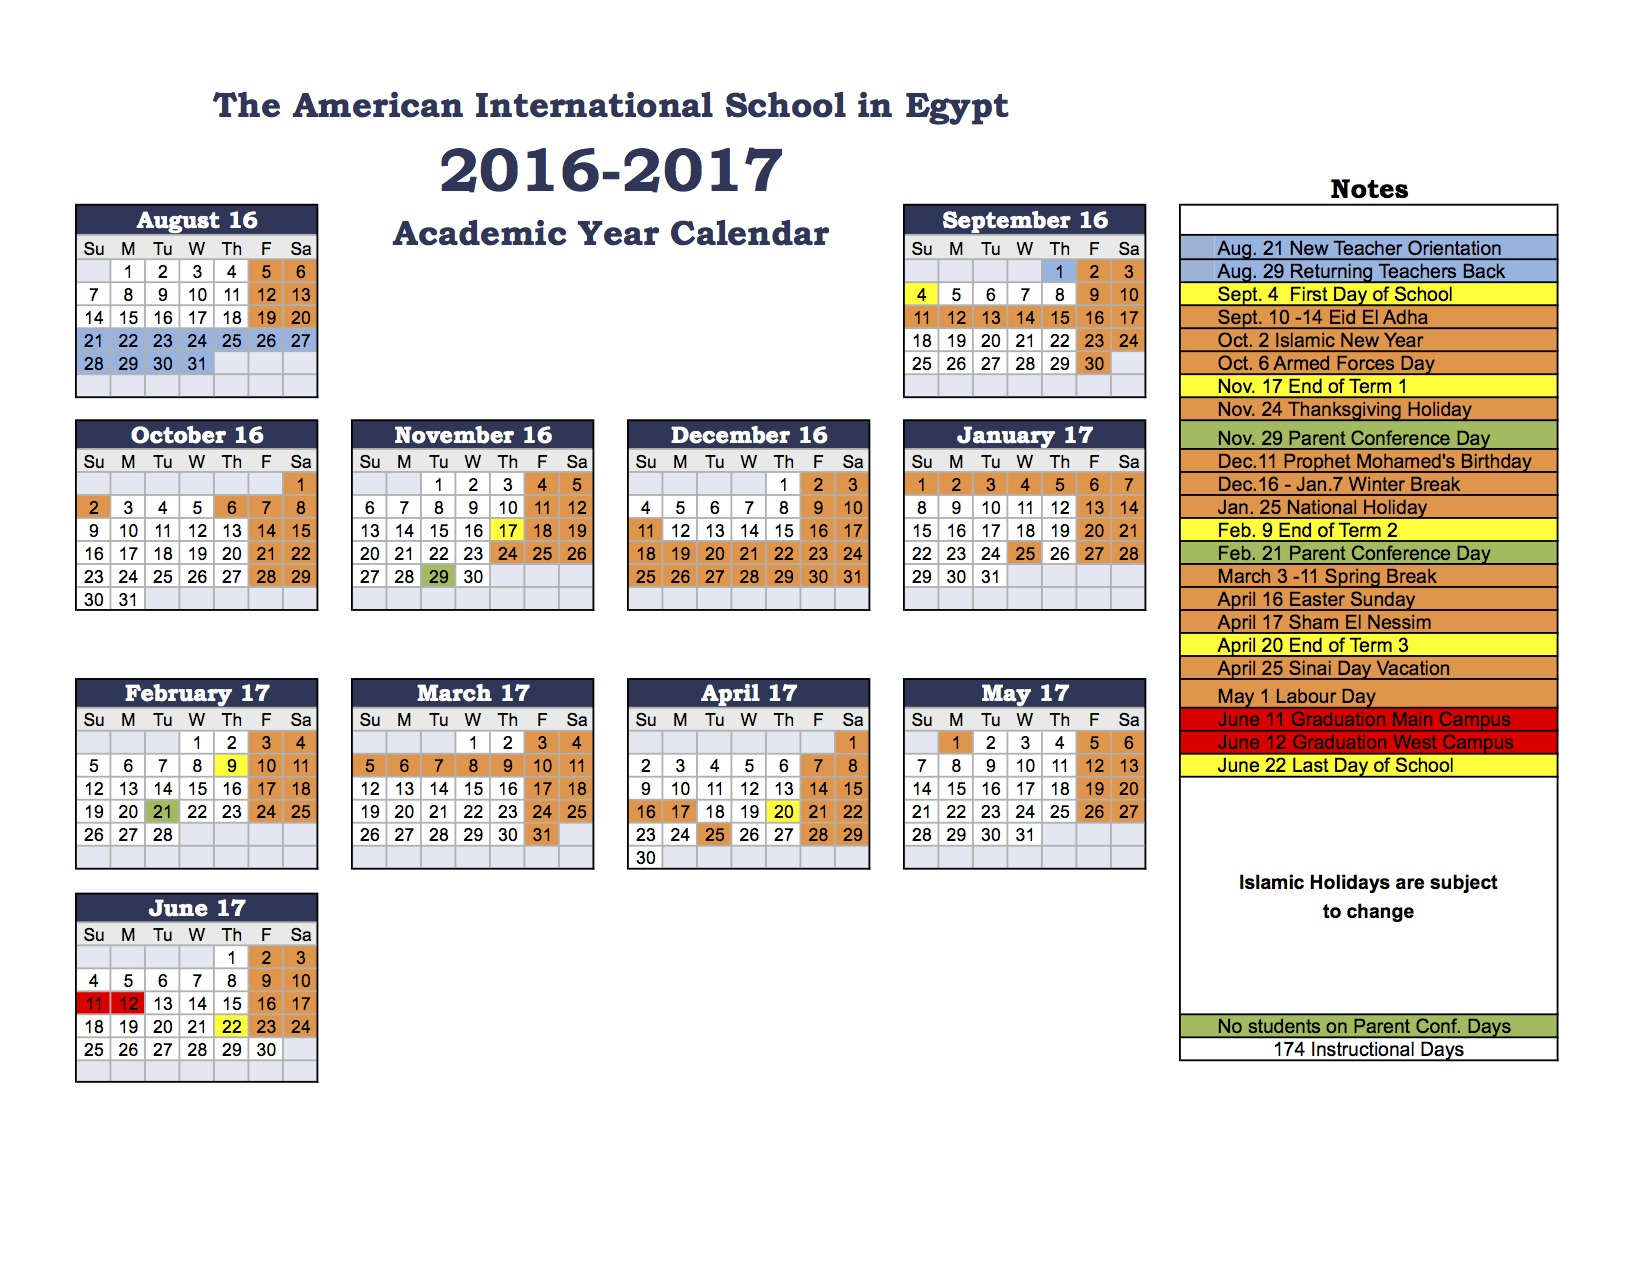 Vacation schedule for 2016 - 2017 school year: complete schedule